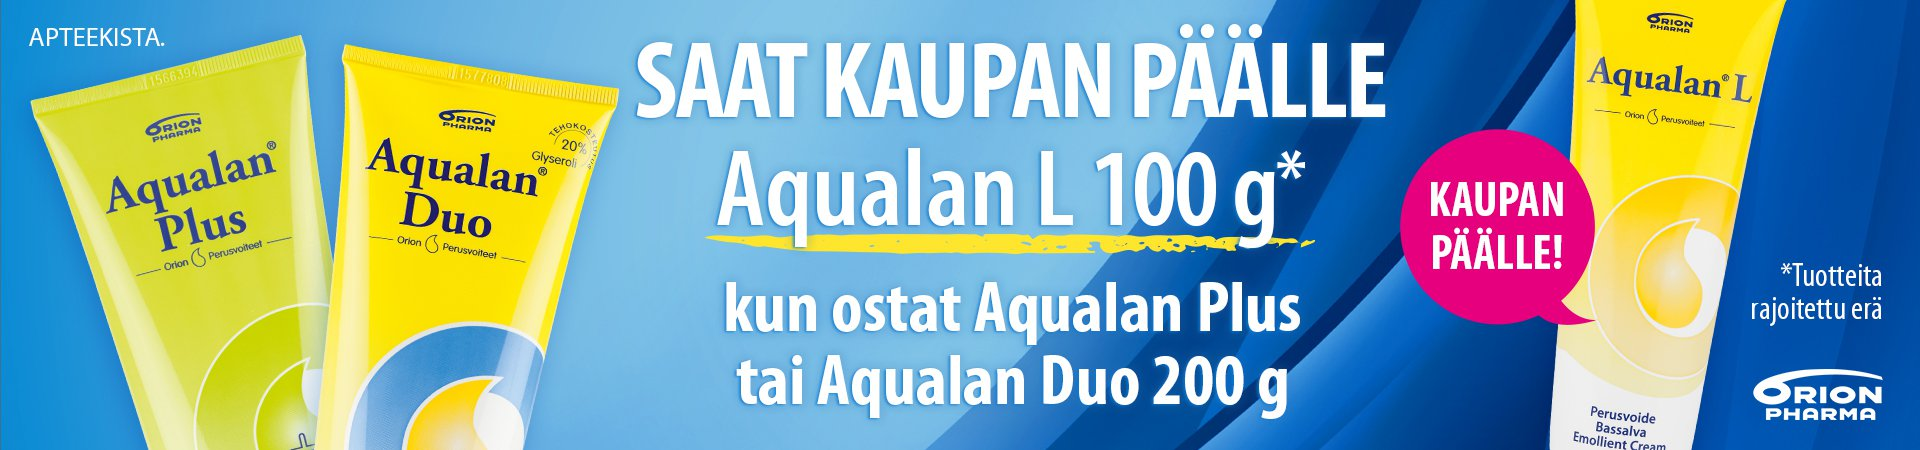 Aqualan perusvoidekampanja